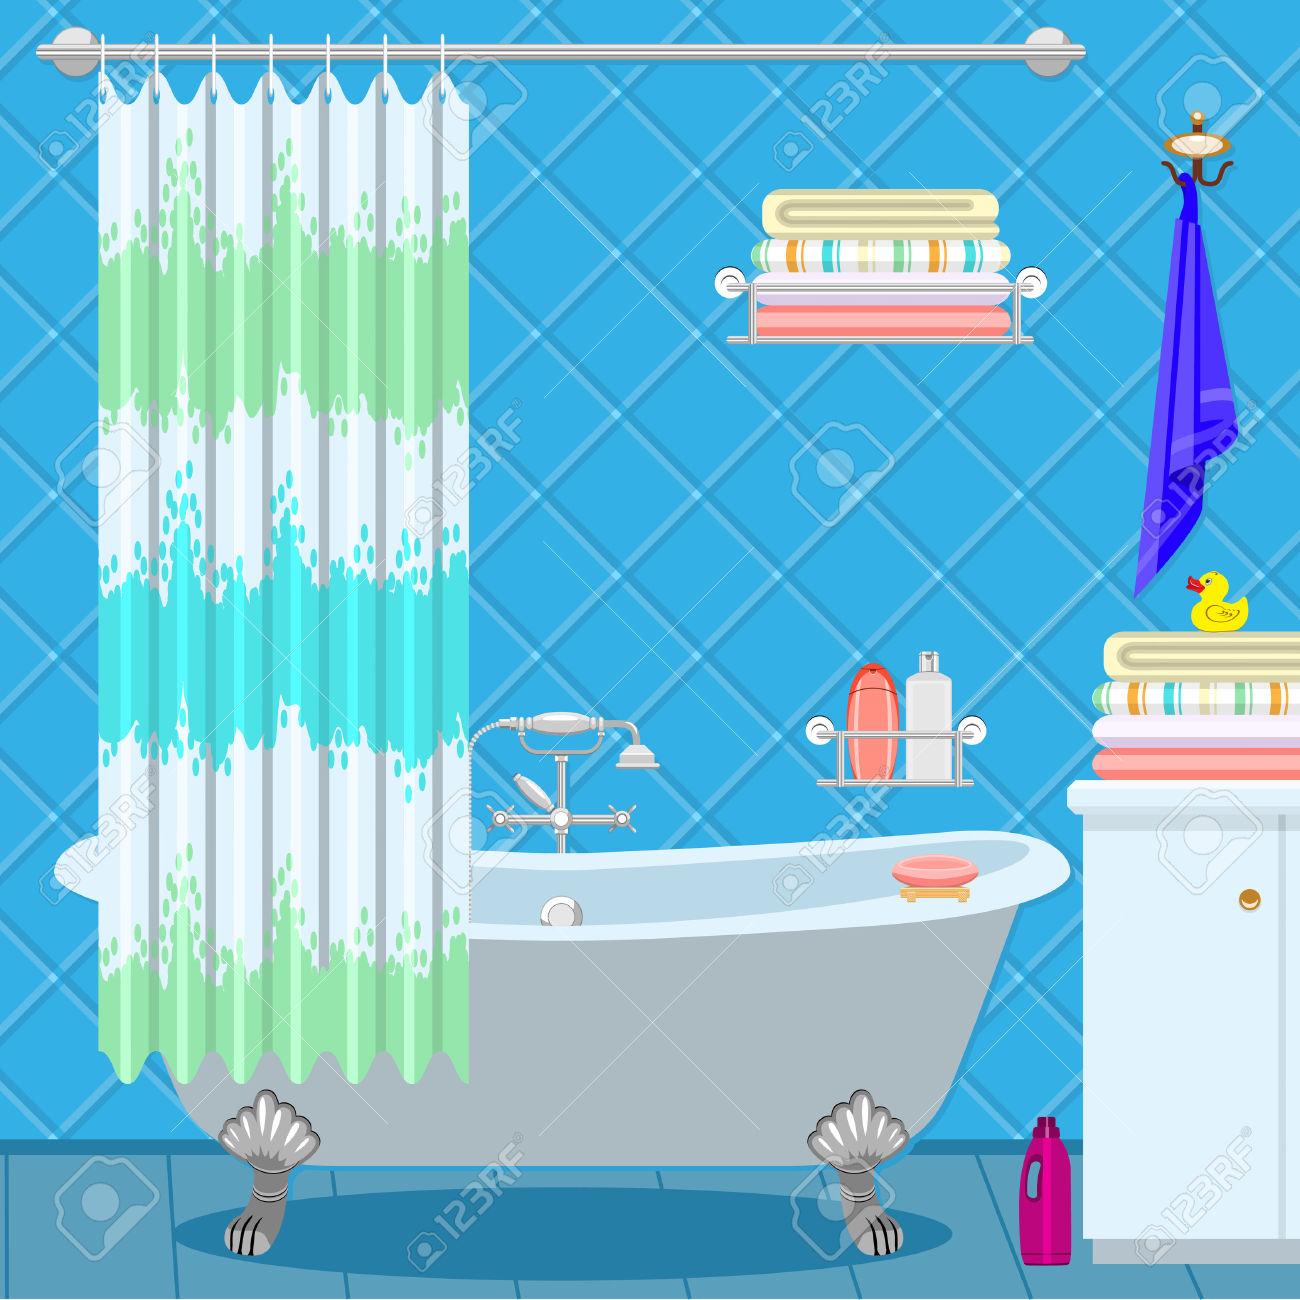 Bathroom Equipment. Bath On The Legs Of A Blue.